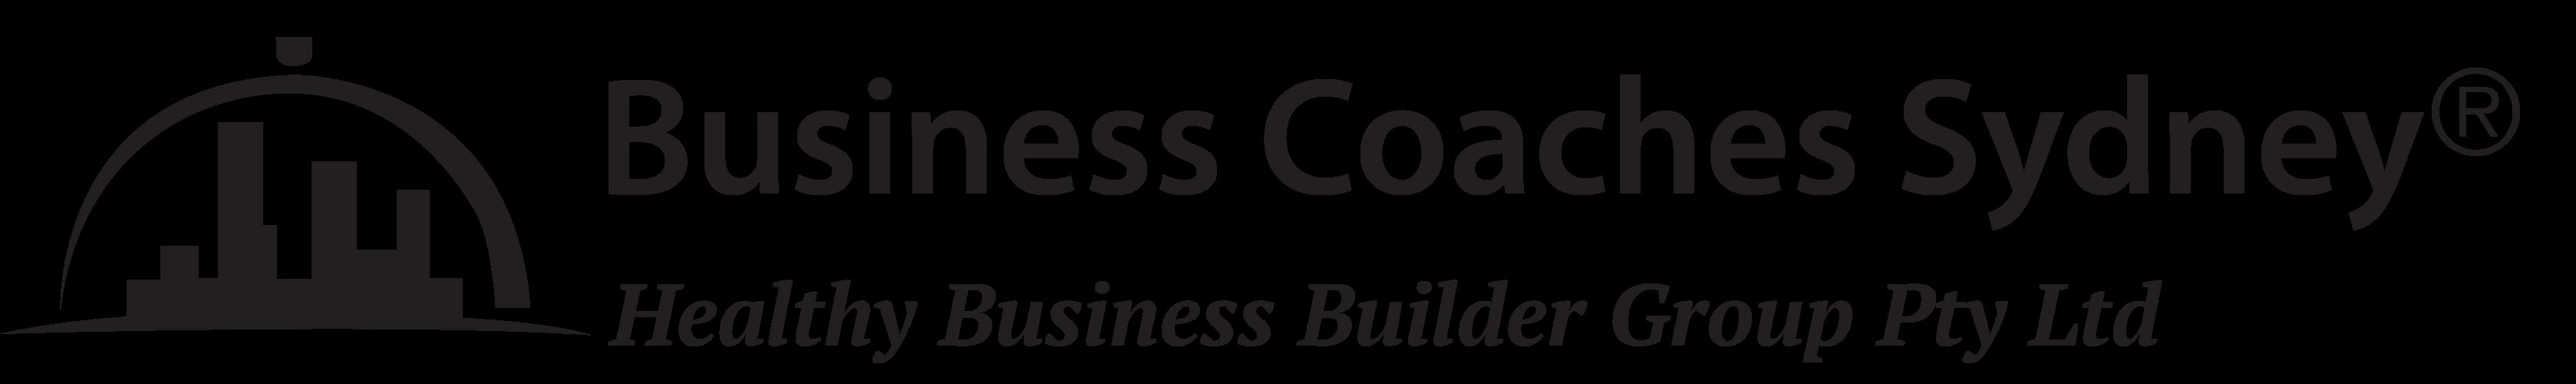 BUSINESSCOACHESSYDNEY.COM.AU